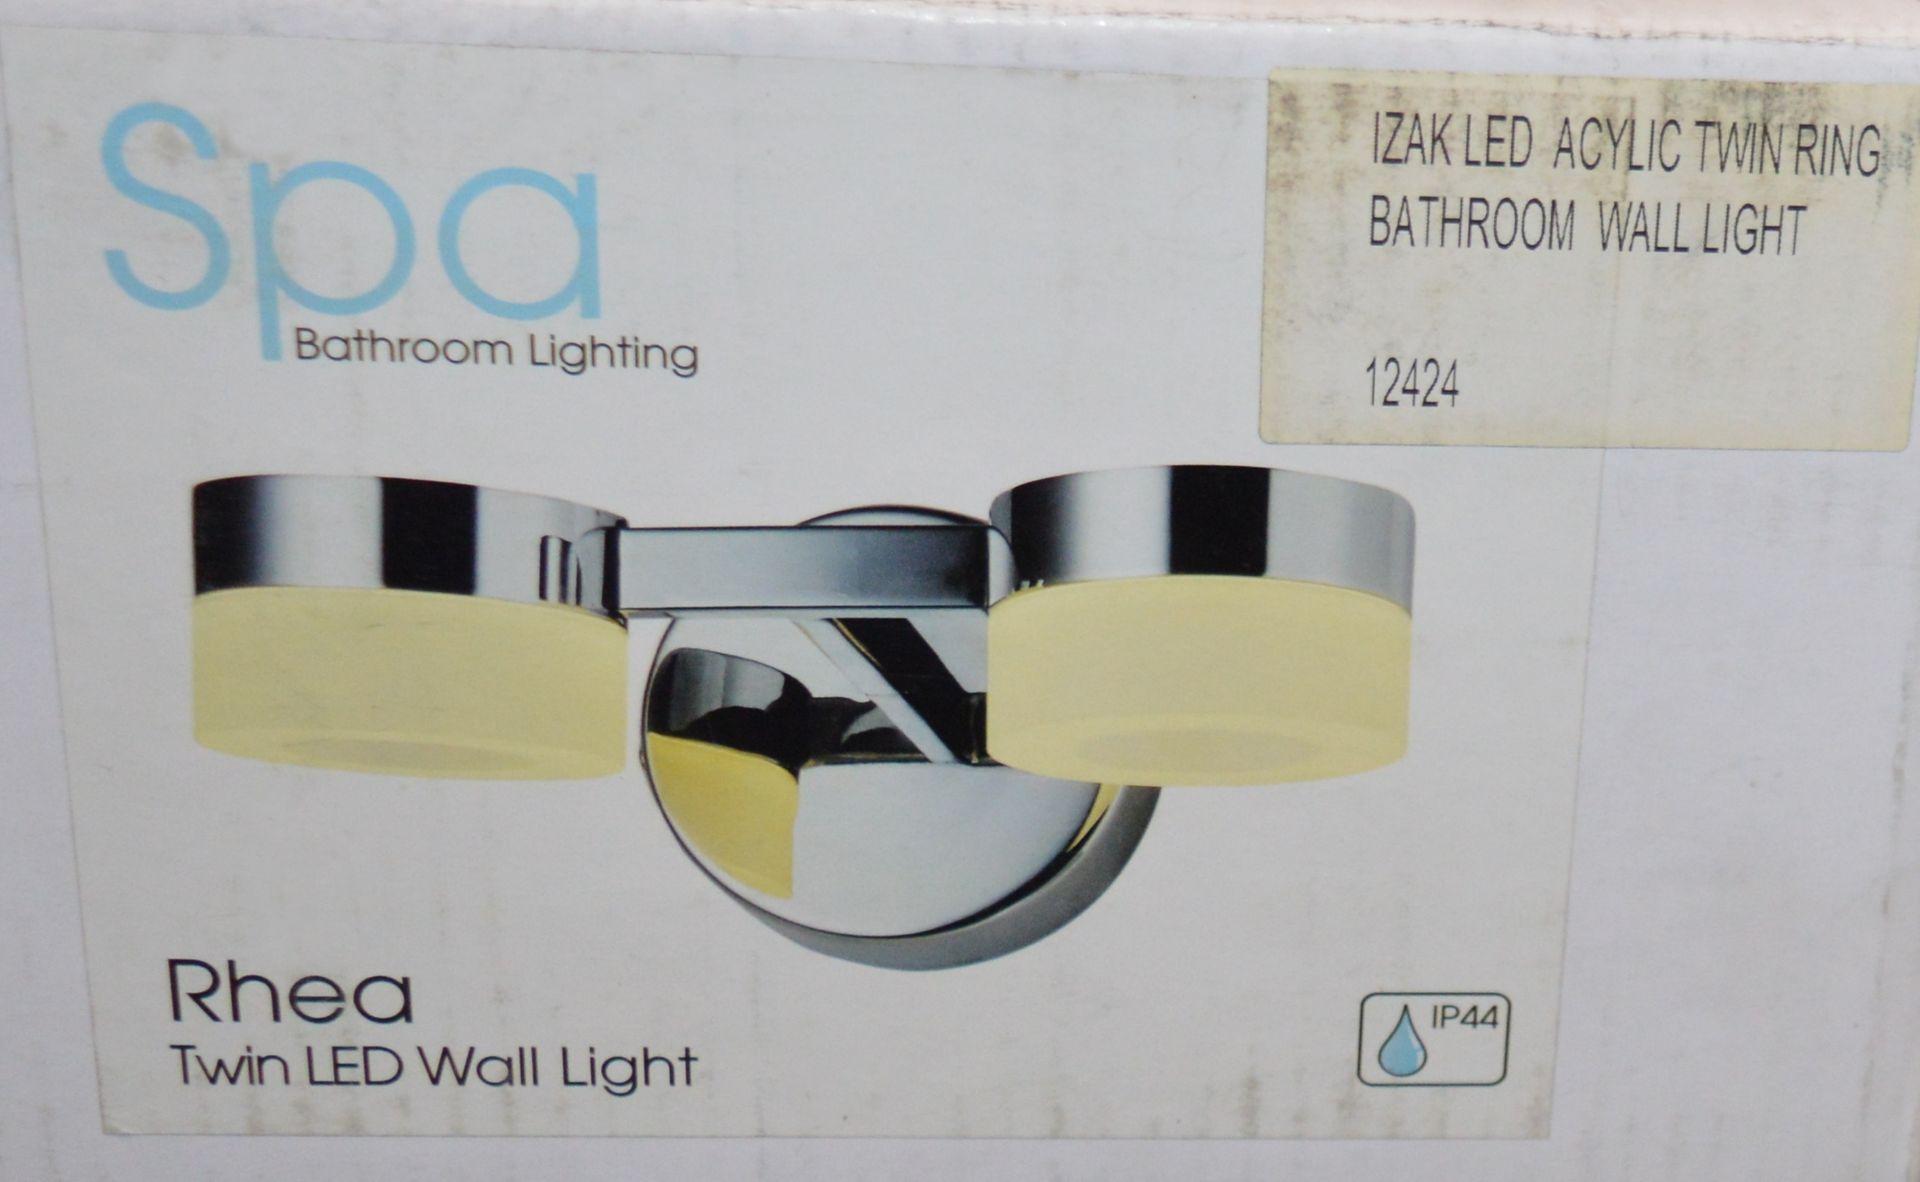 Lot 9142 - 2 x Spa Bathroom Lighting RHEA Twin LED Wall Lights With Acrylic Ring Shades and Chrome Finish -